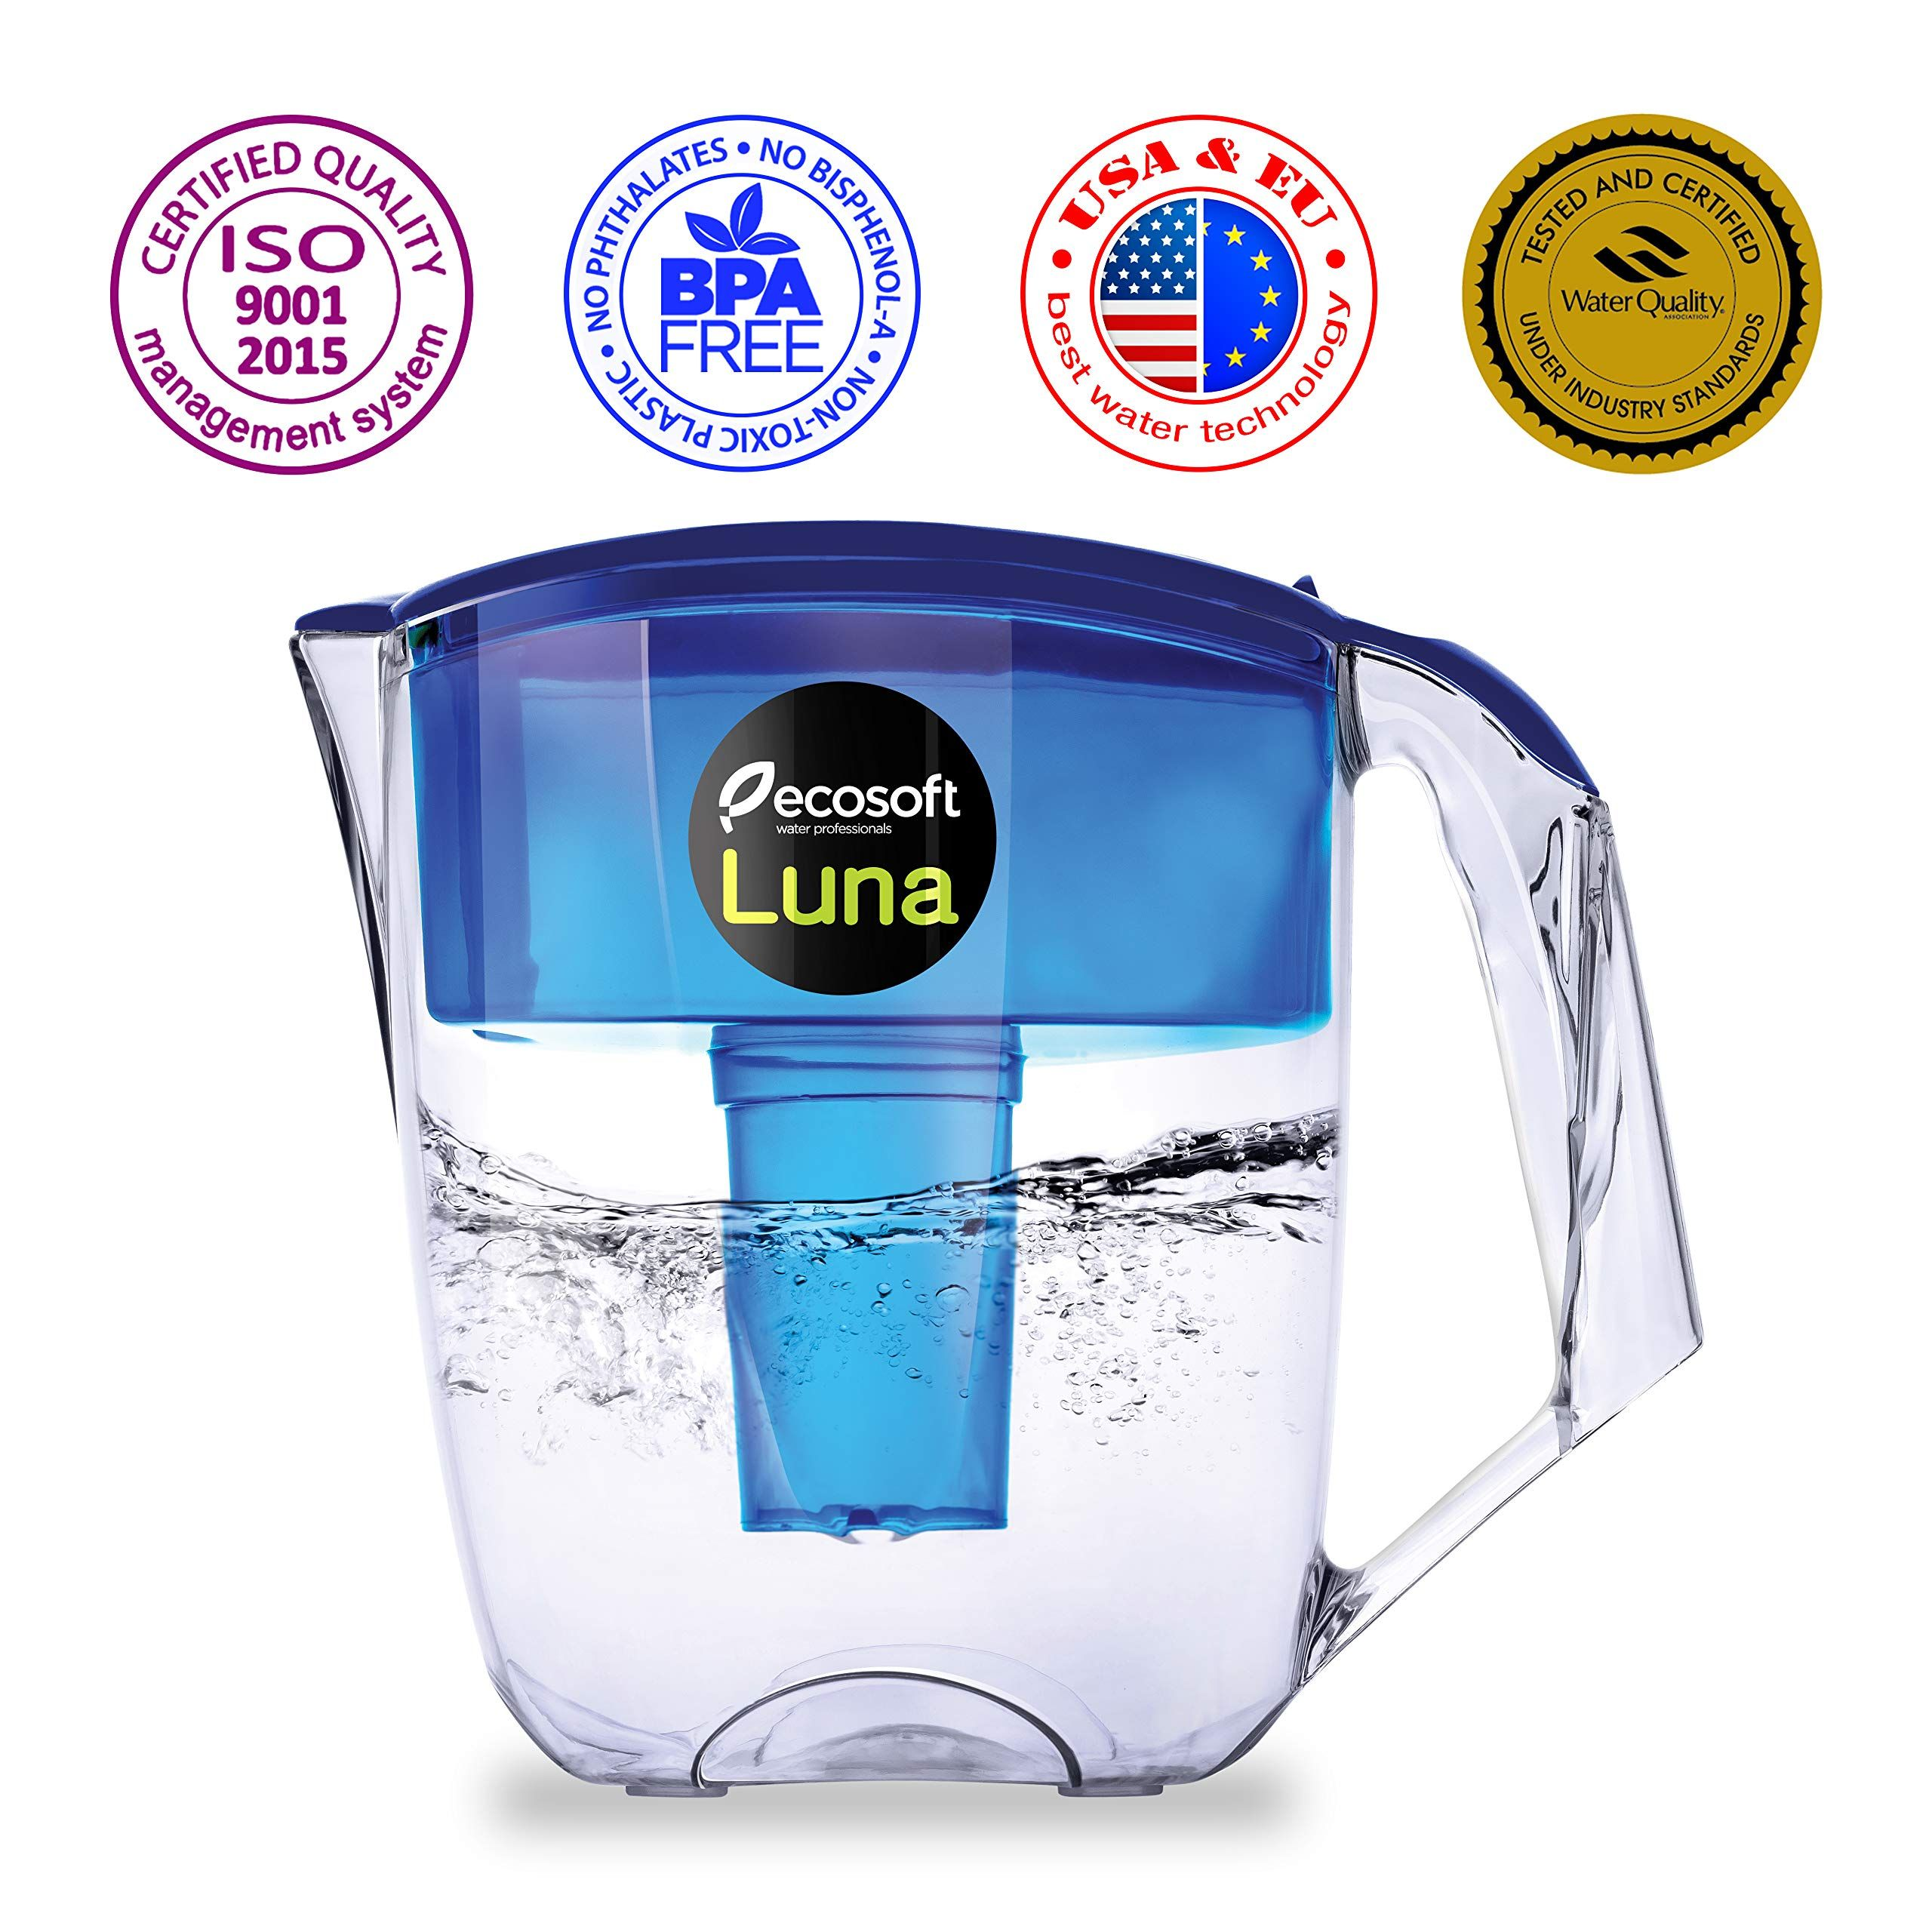 Ecosoft Water Filter Pitcher Water Dispenser And Purifier